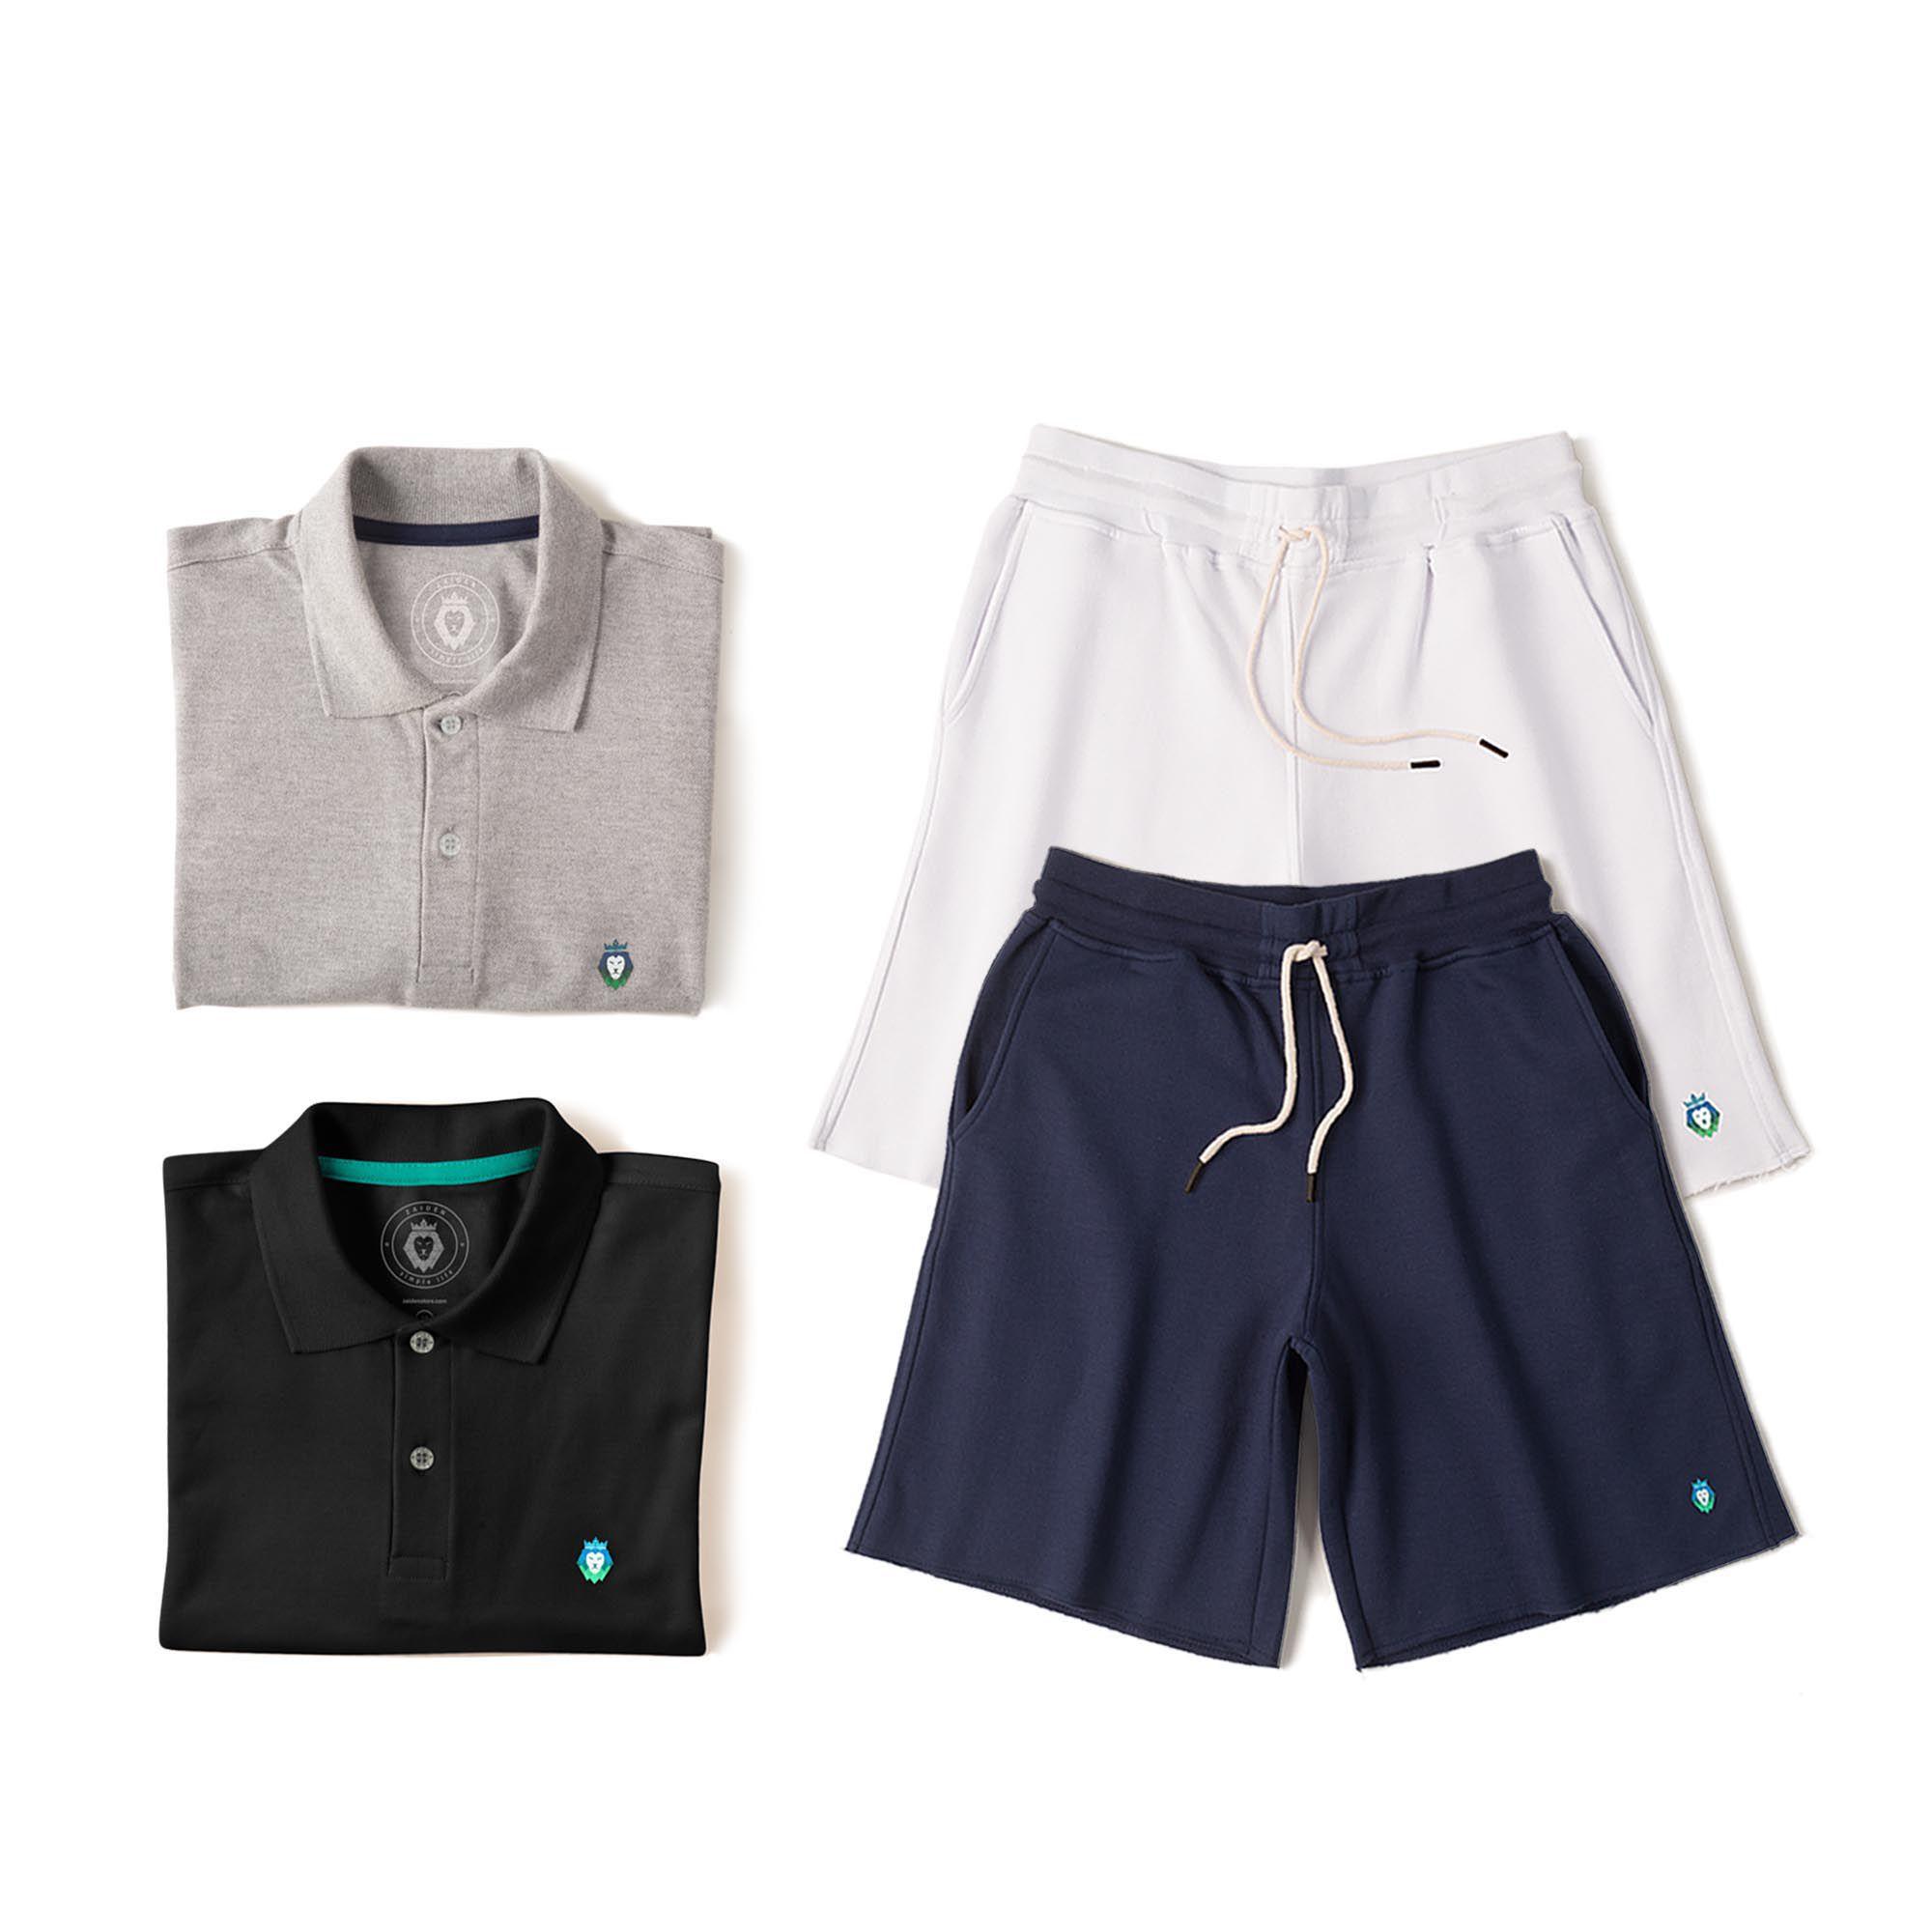 Kit 2 Bermudas Basic Branca Azul Marinho + 2 Camisas Polo Style Mescla Preta Zaiden Masculina